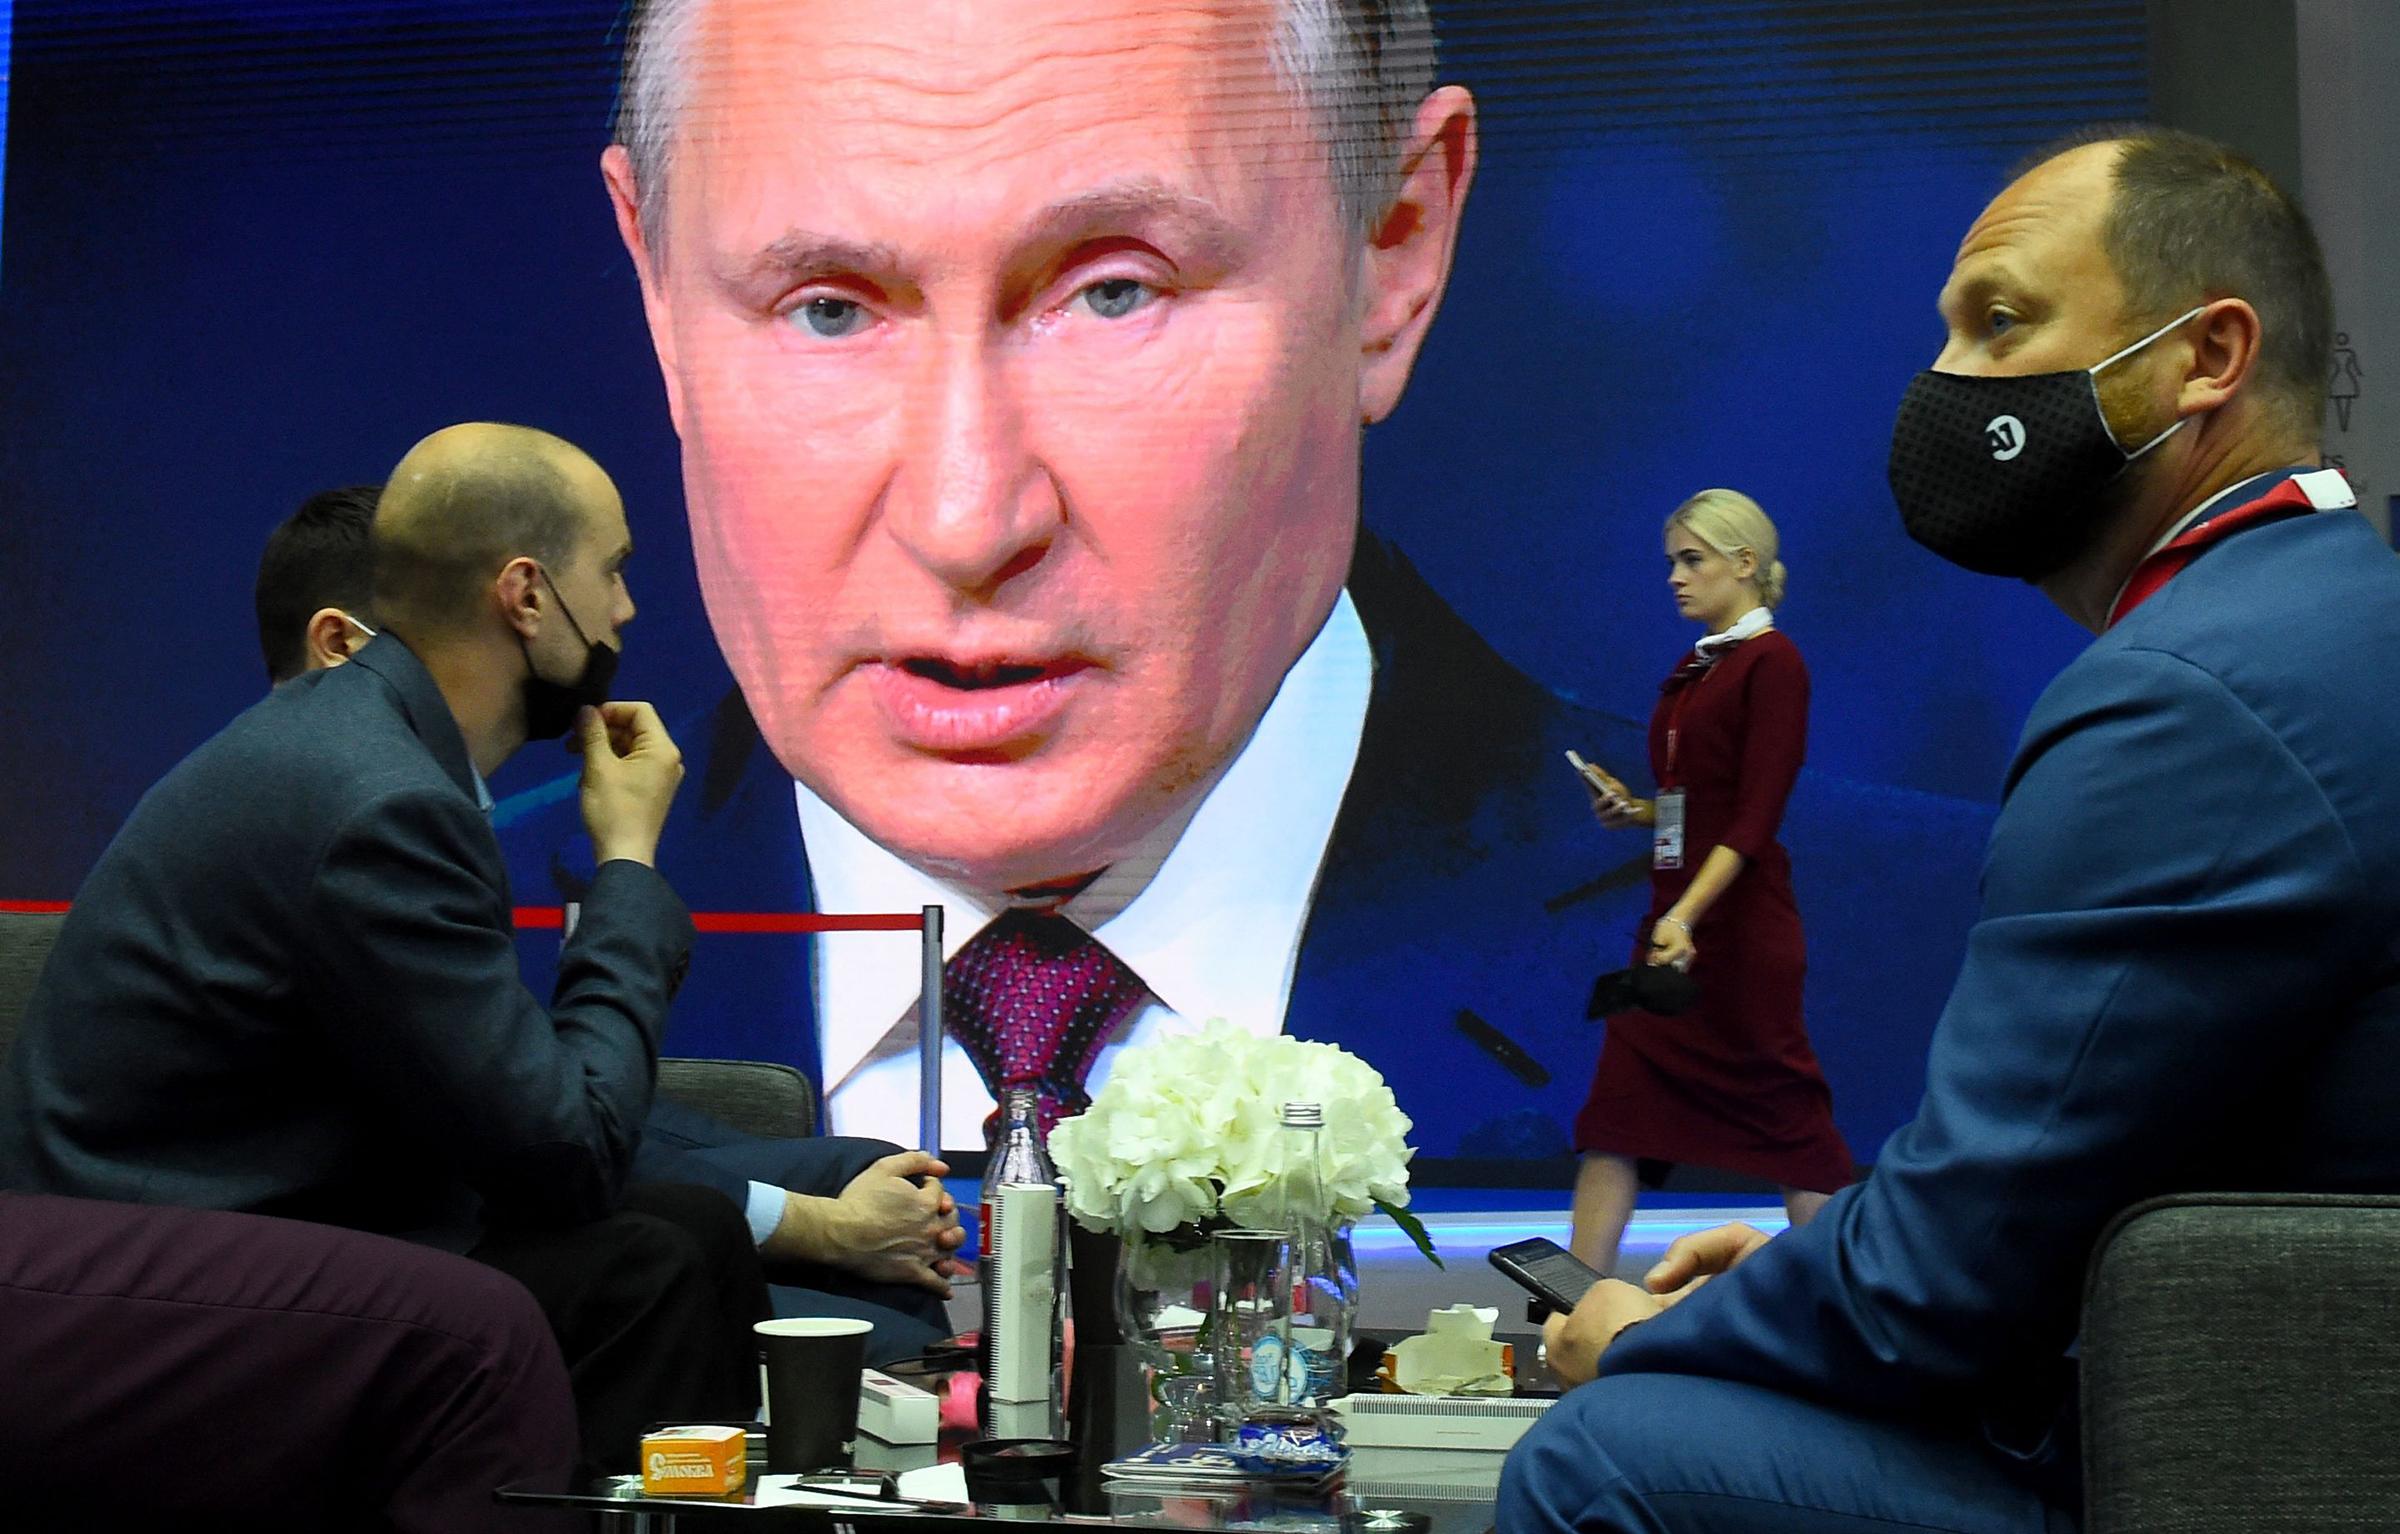 Putin speaking at the St. Petersburg International Economic Forum (SPIEF) on June 4,